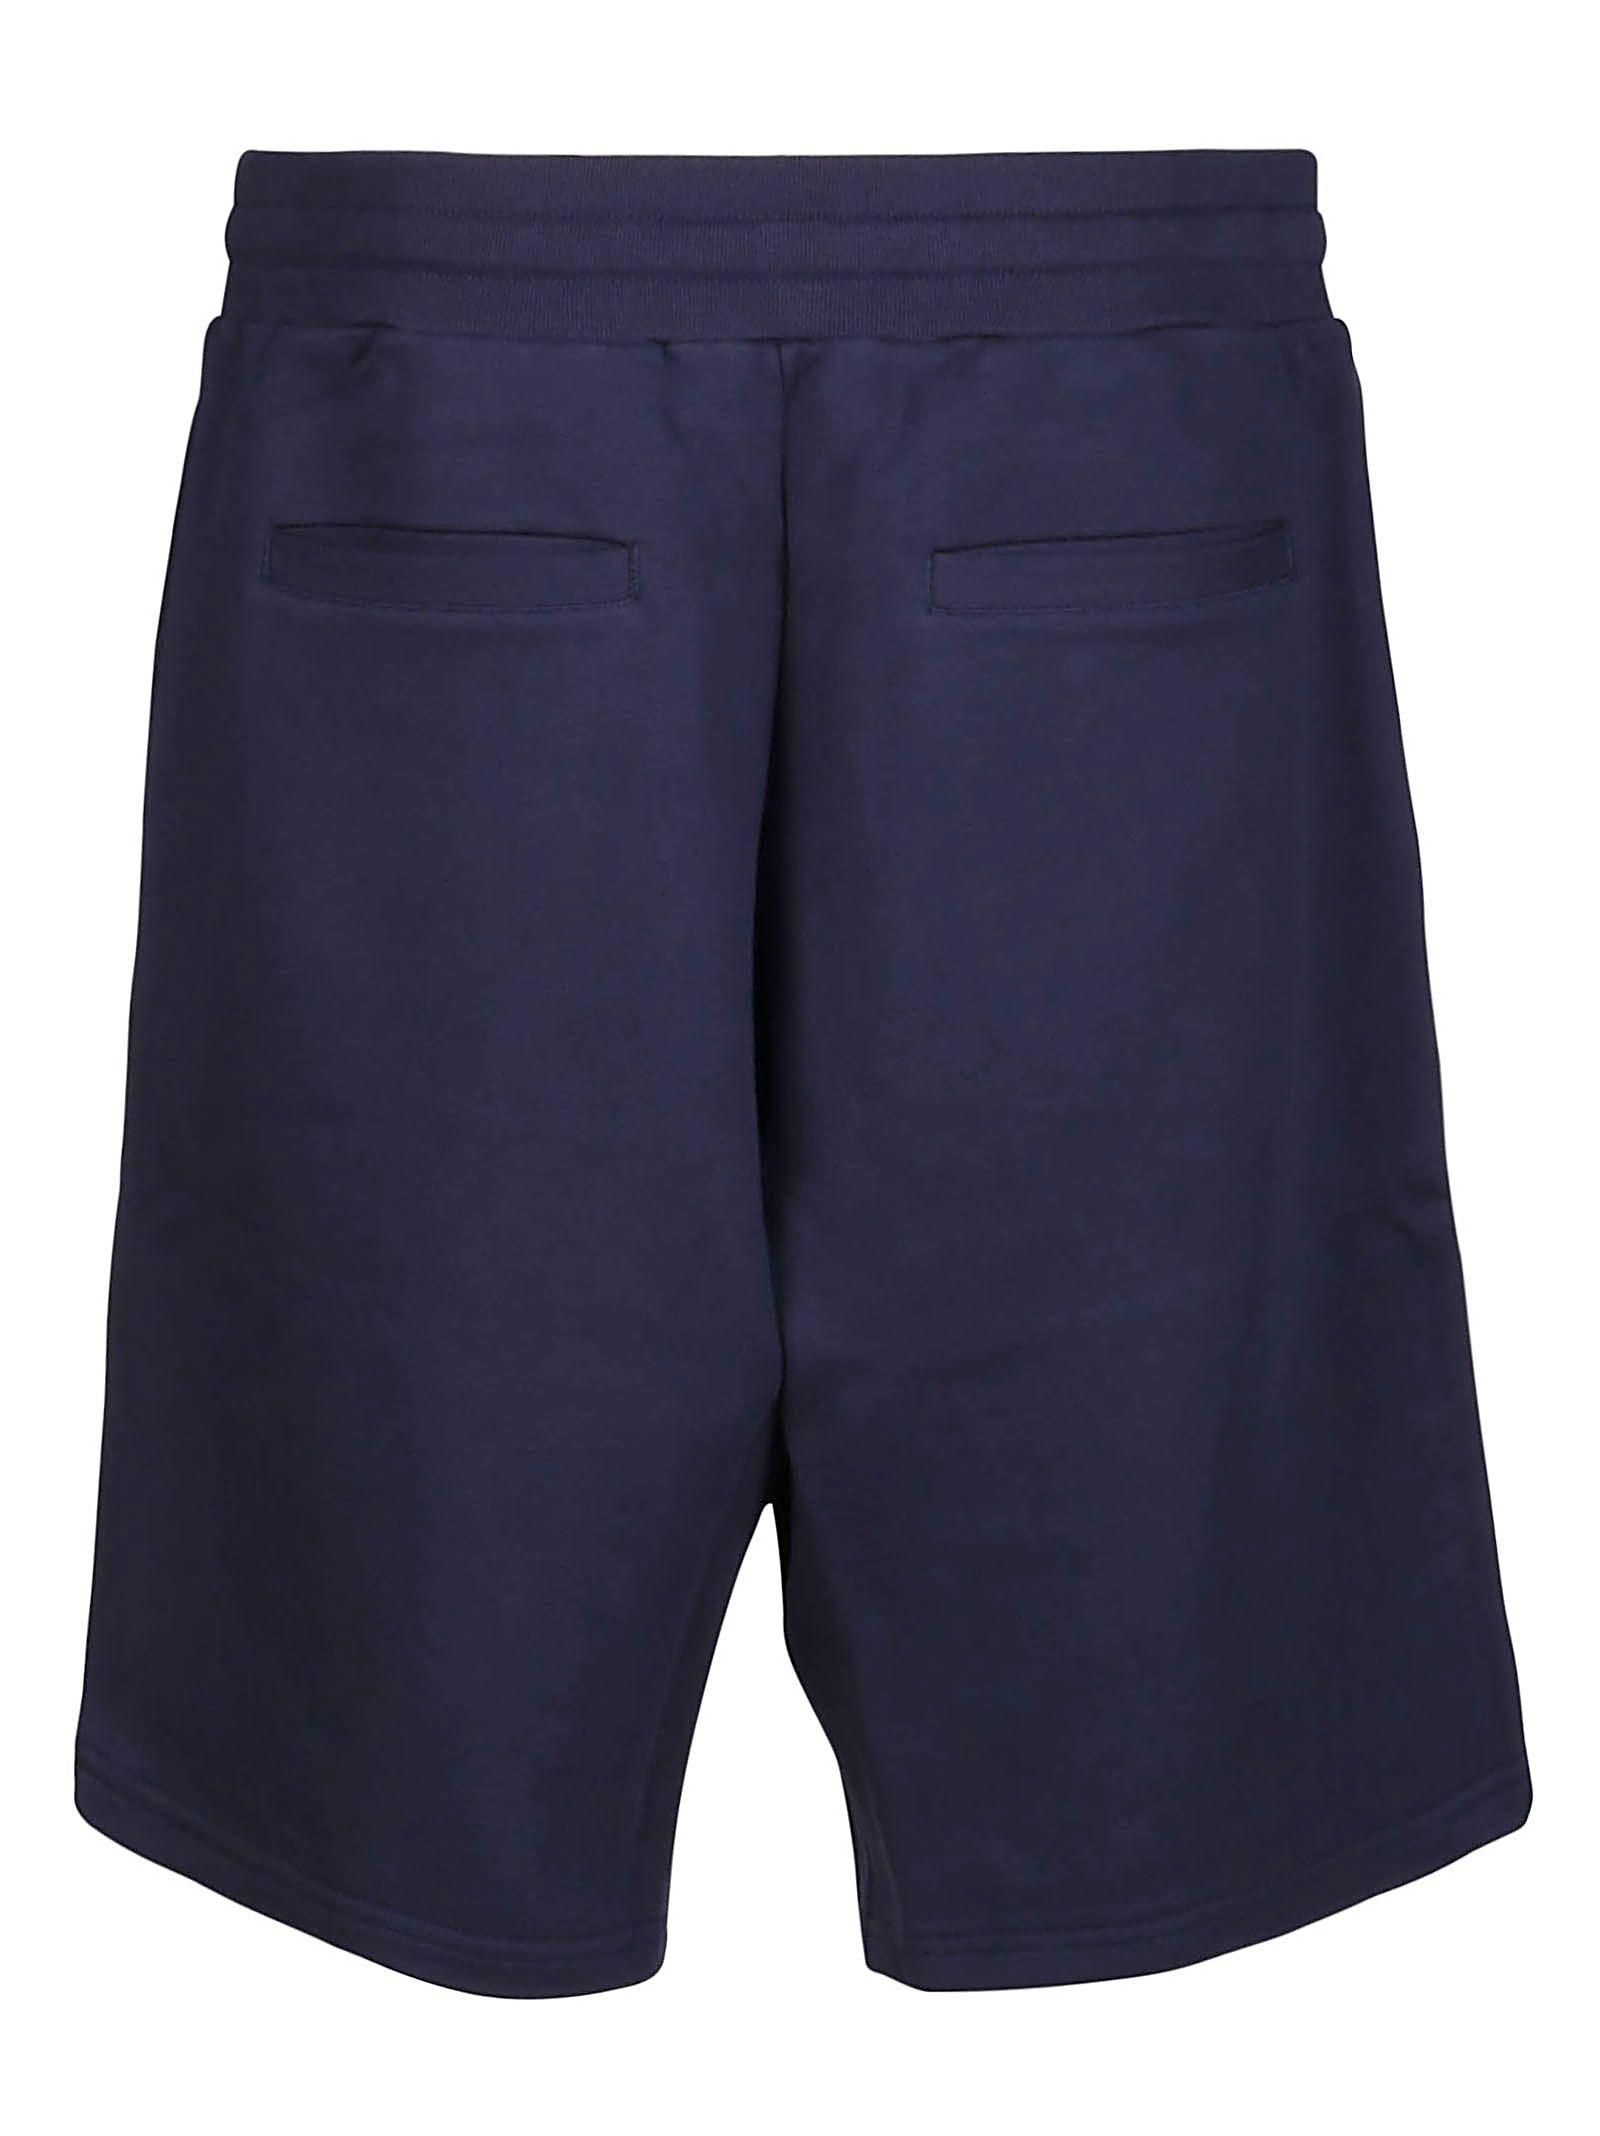 MOSCHINO Cottons MOSCHINO MEN'S BLUE COTTON SHORTS